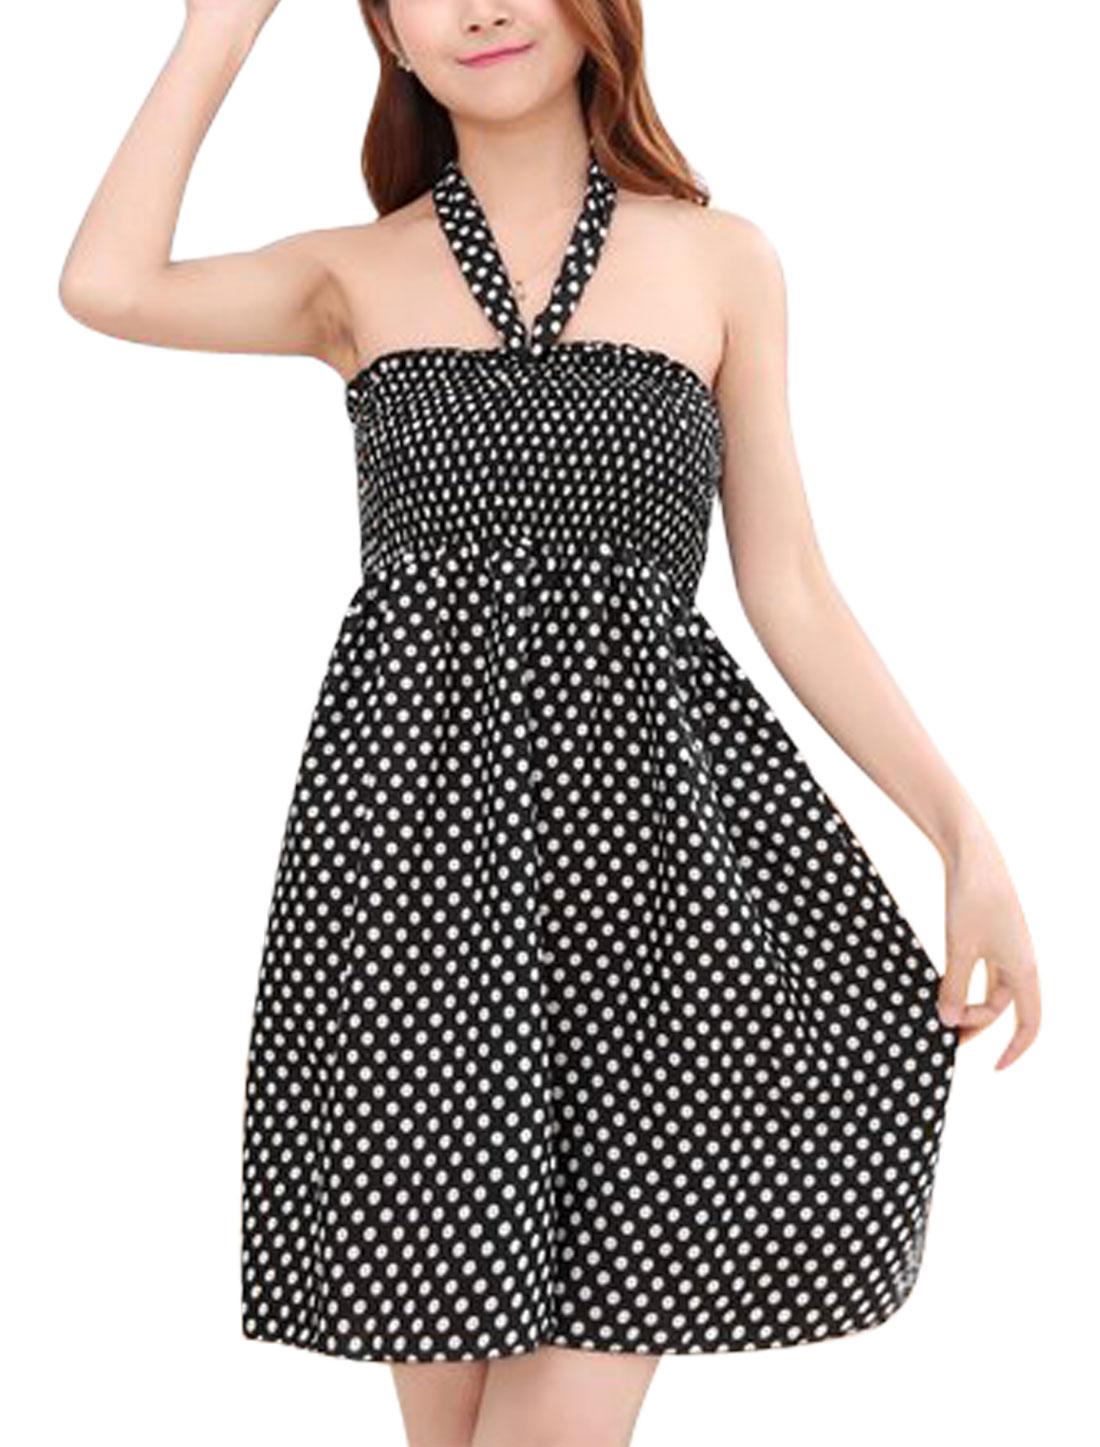 Women Halter Neck Smocked Sleeveless Dots Prints A-Line Dress Black S